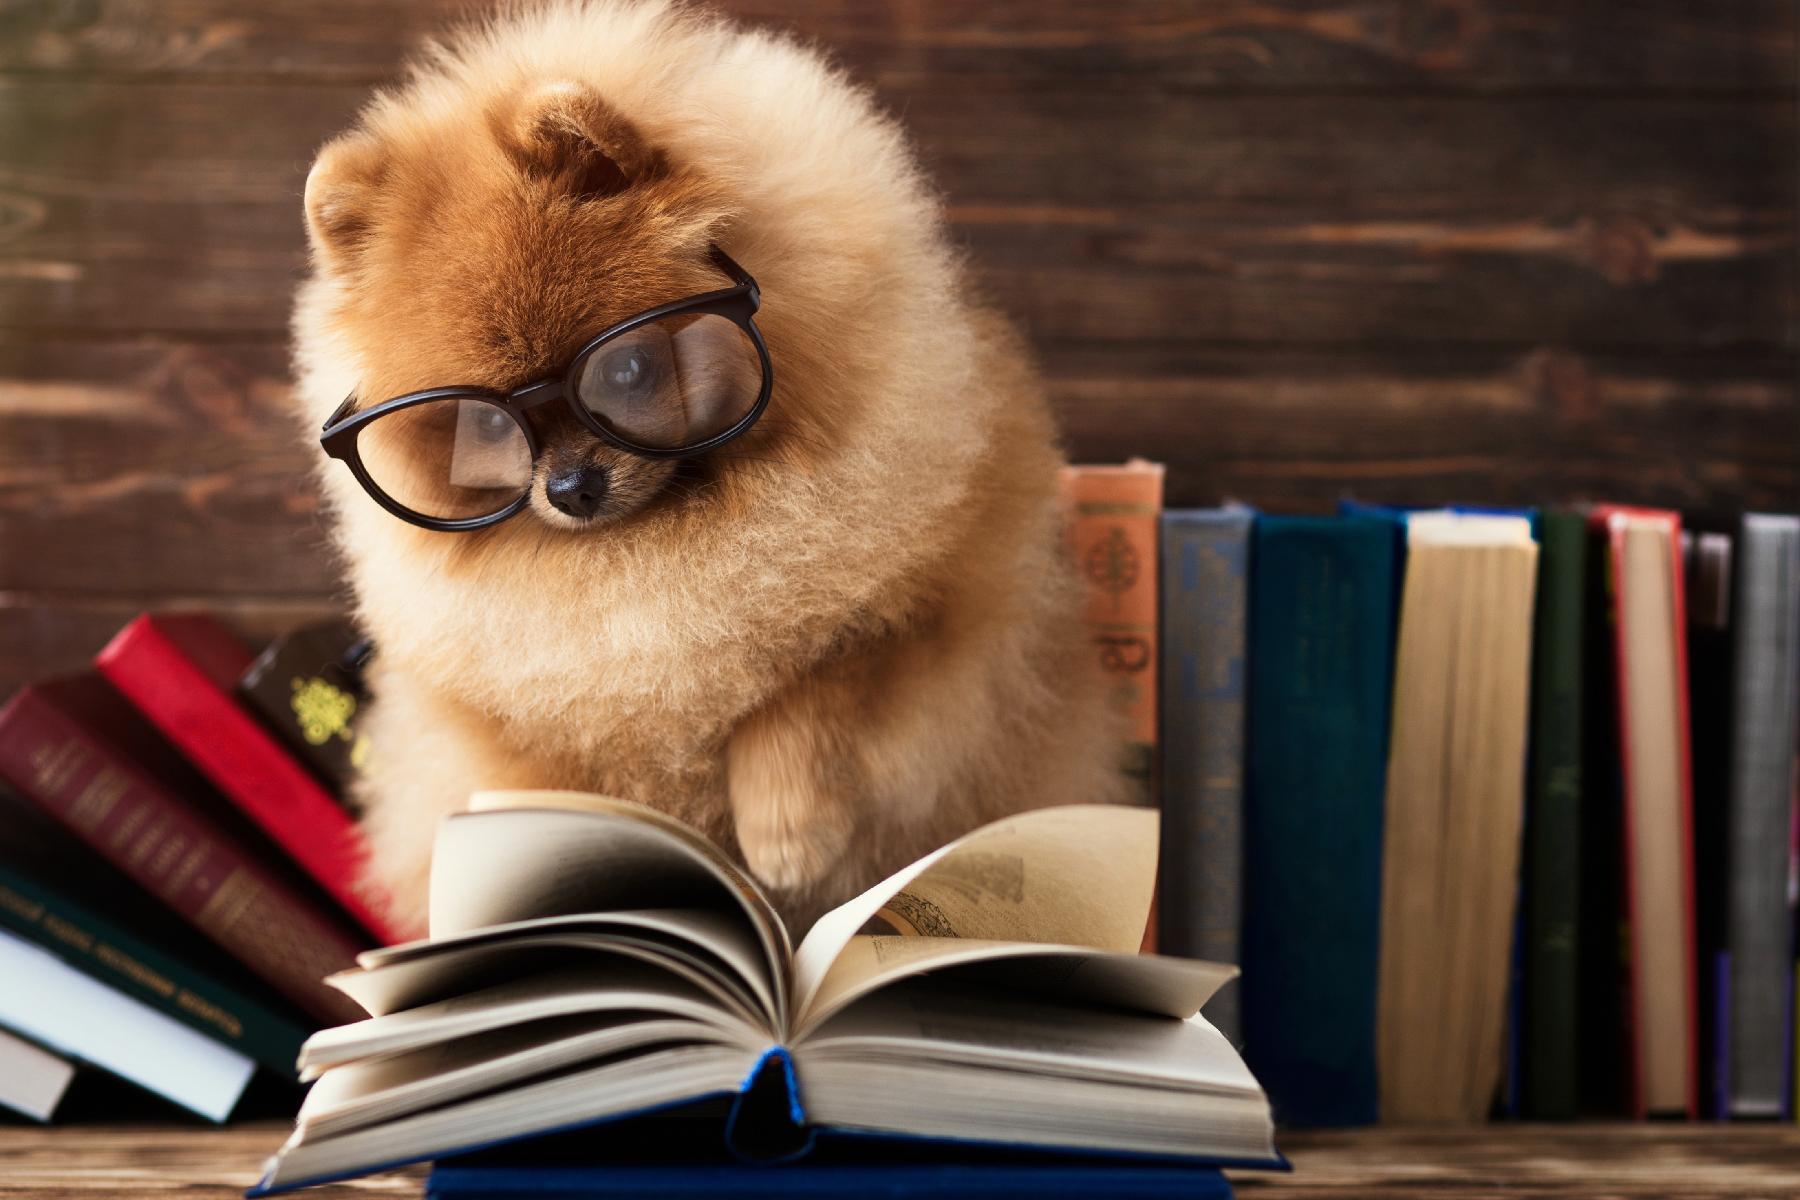 pets_in_books_header.jpg